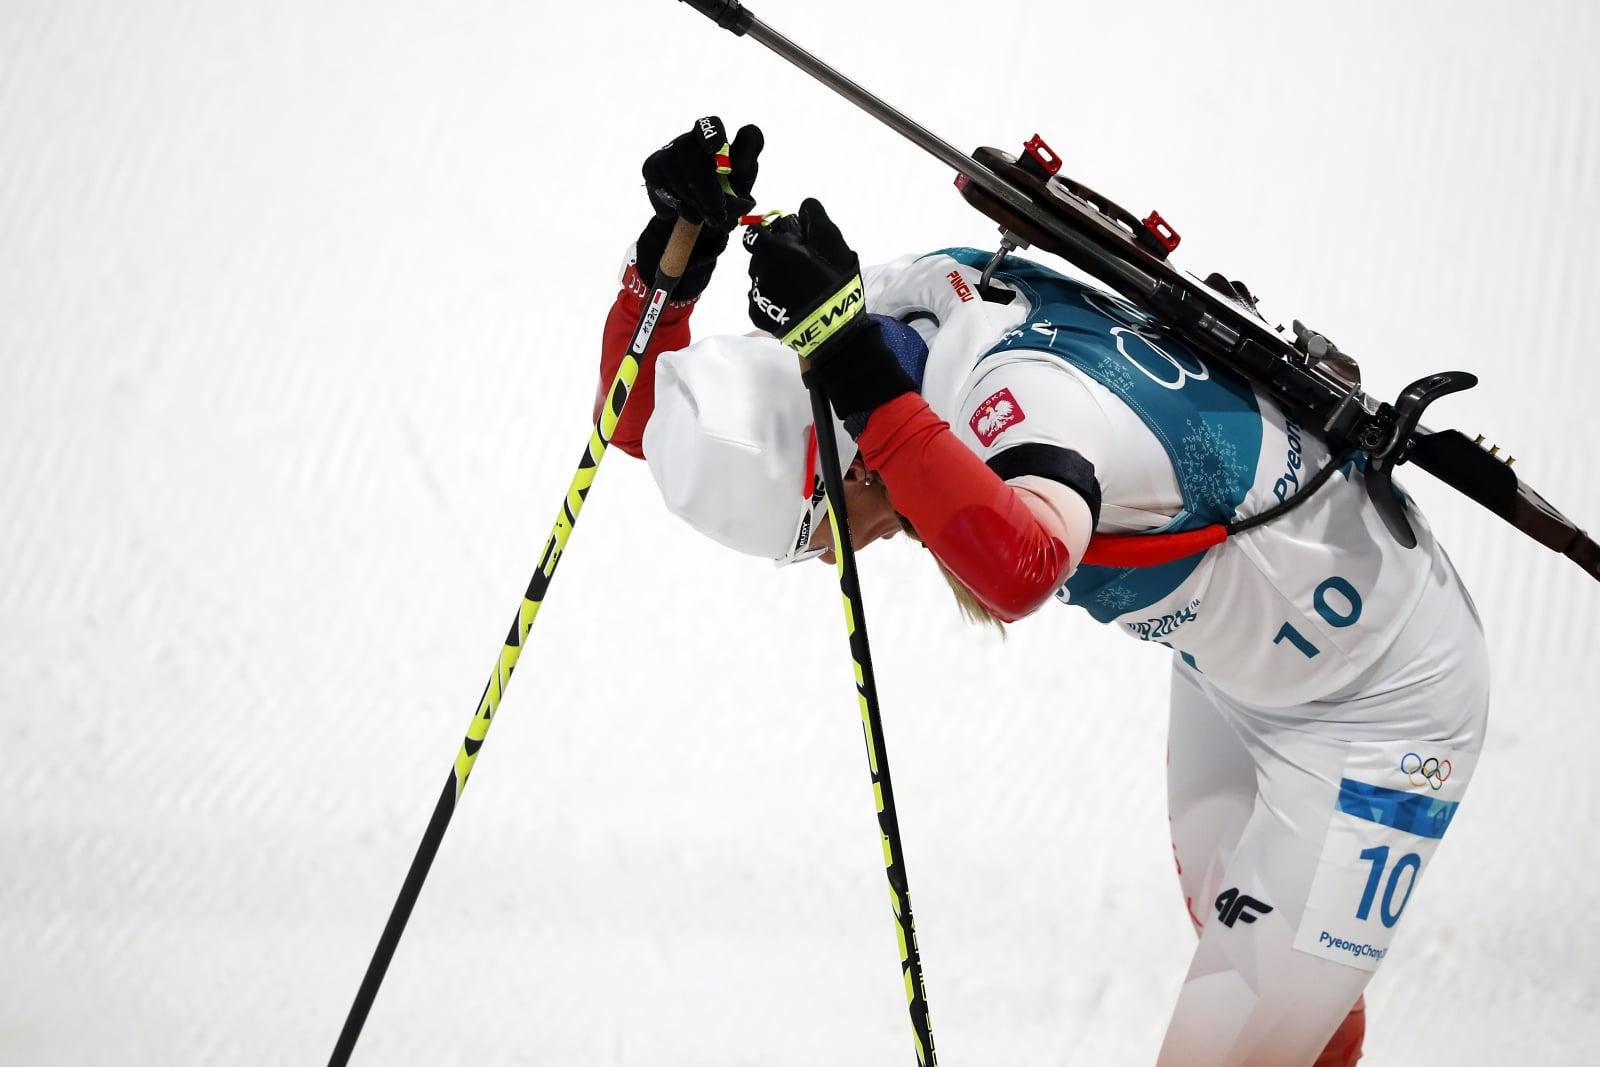 epa06511069 Weronika Nowakowska of Poland reacts after the Women's Biathlon 7,5 km Sprint race at the Alpensia Biathlon Centre during the PyeongChang 2018 Olympic Games, South Korea, 10 February 2018.  EPA/JEON HEON-KYUN Dostawca: PAP/EPA.